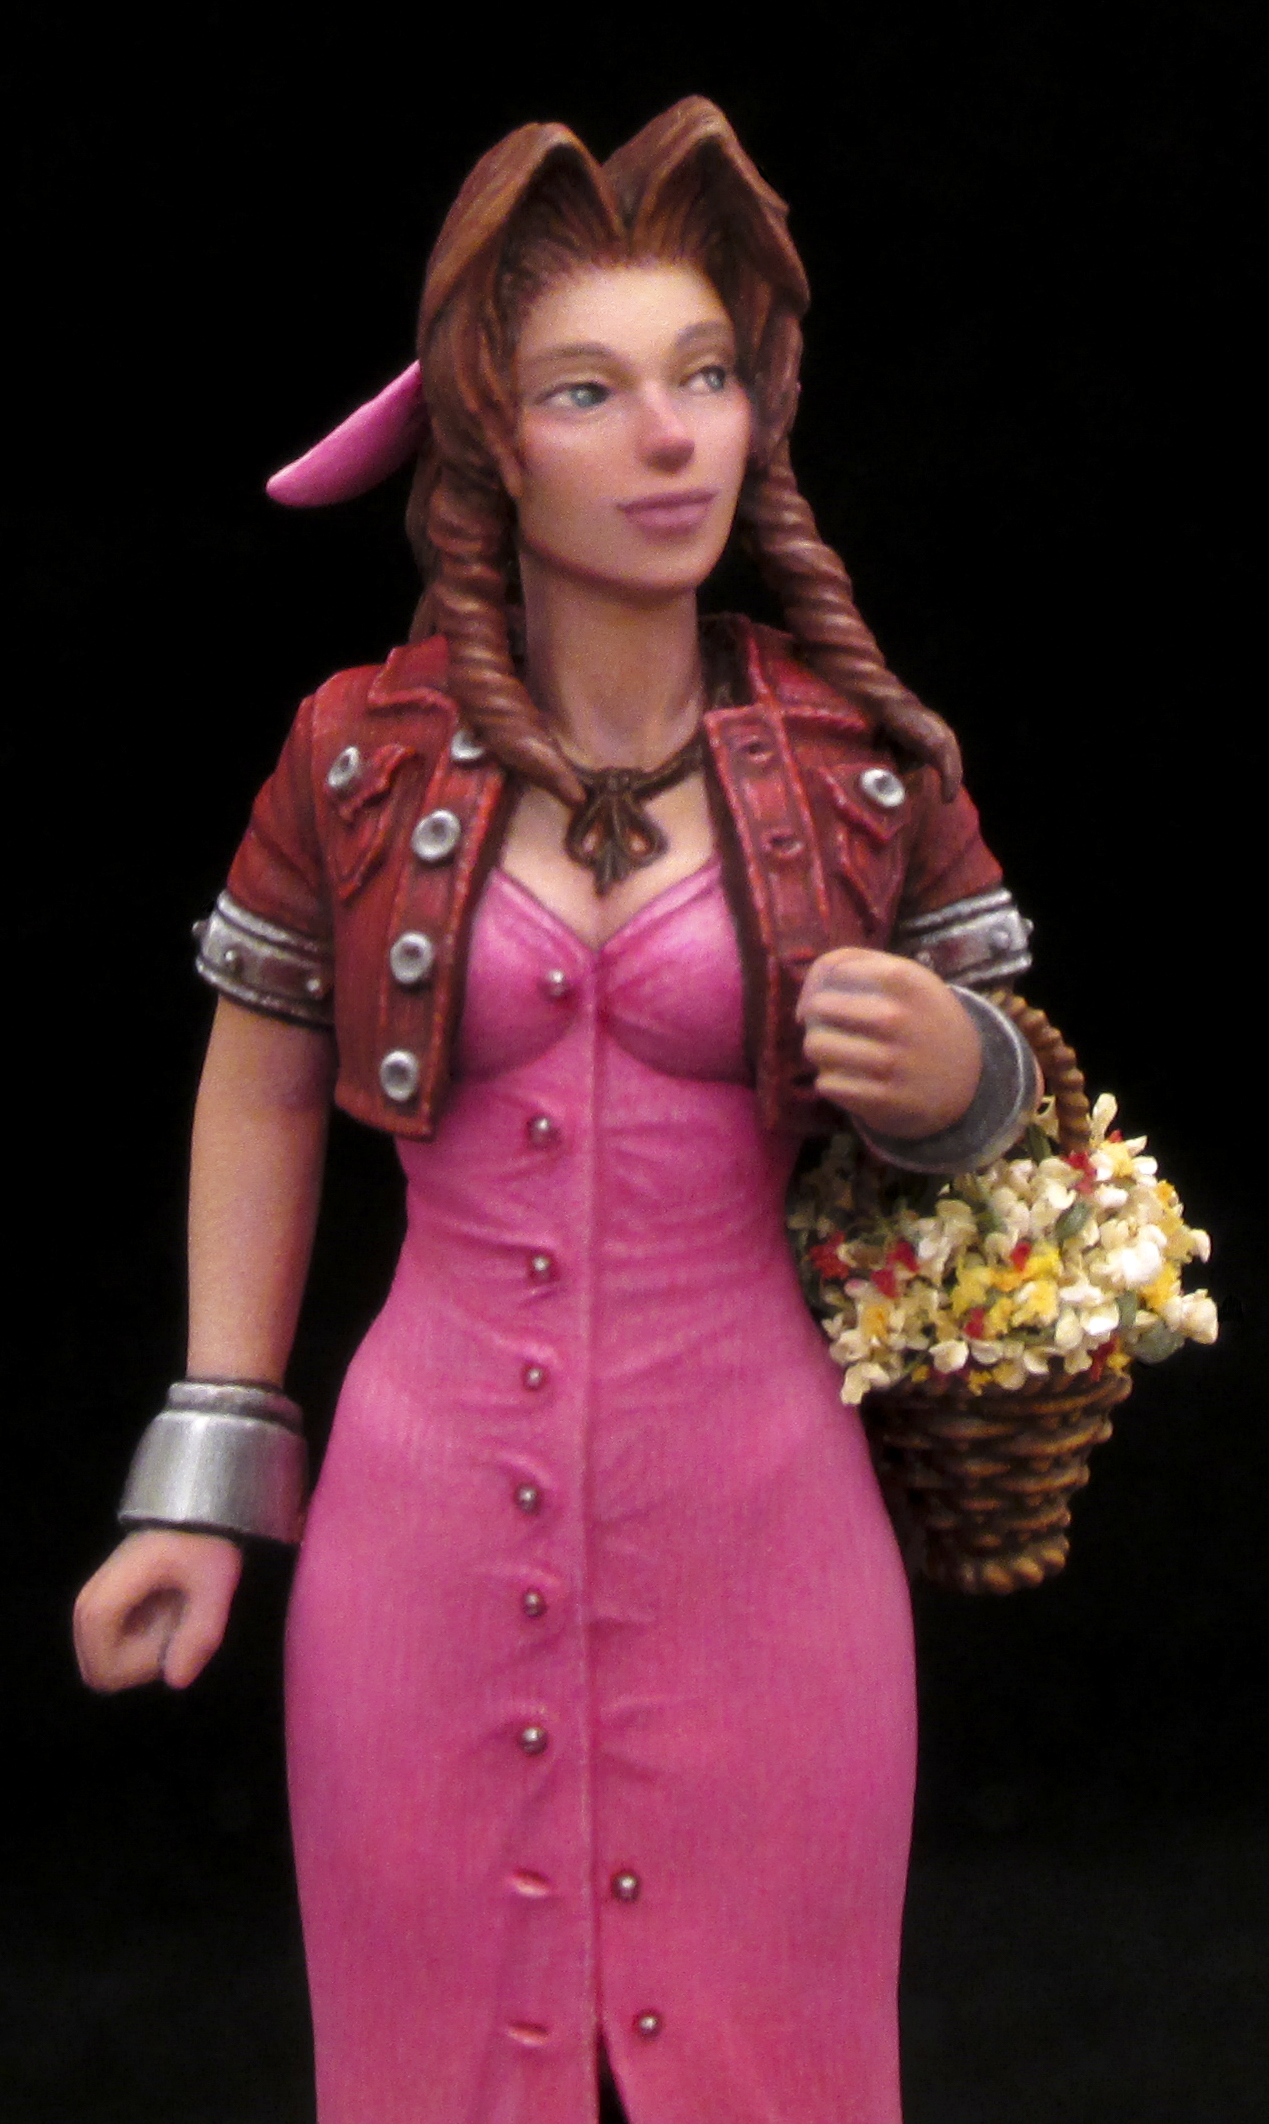 Aeris, the flower girl (2) by NavigatorCat